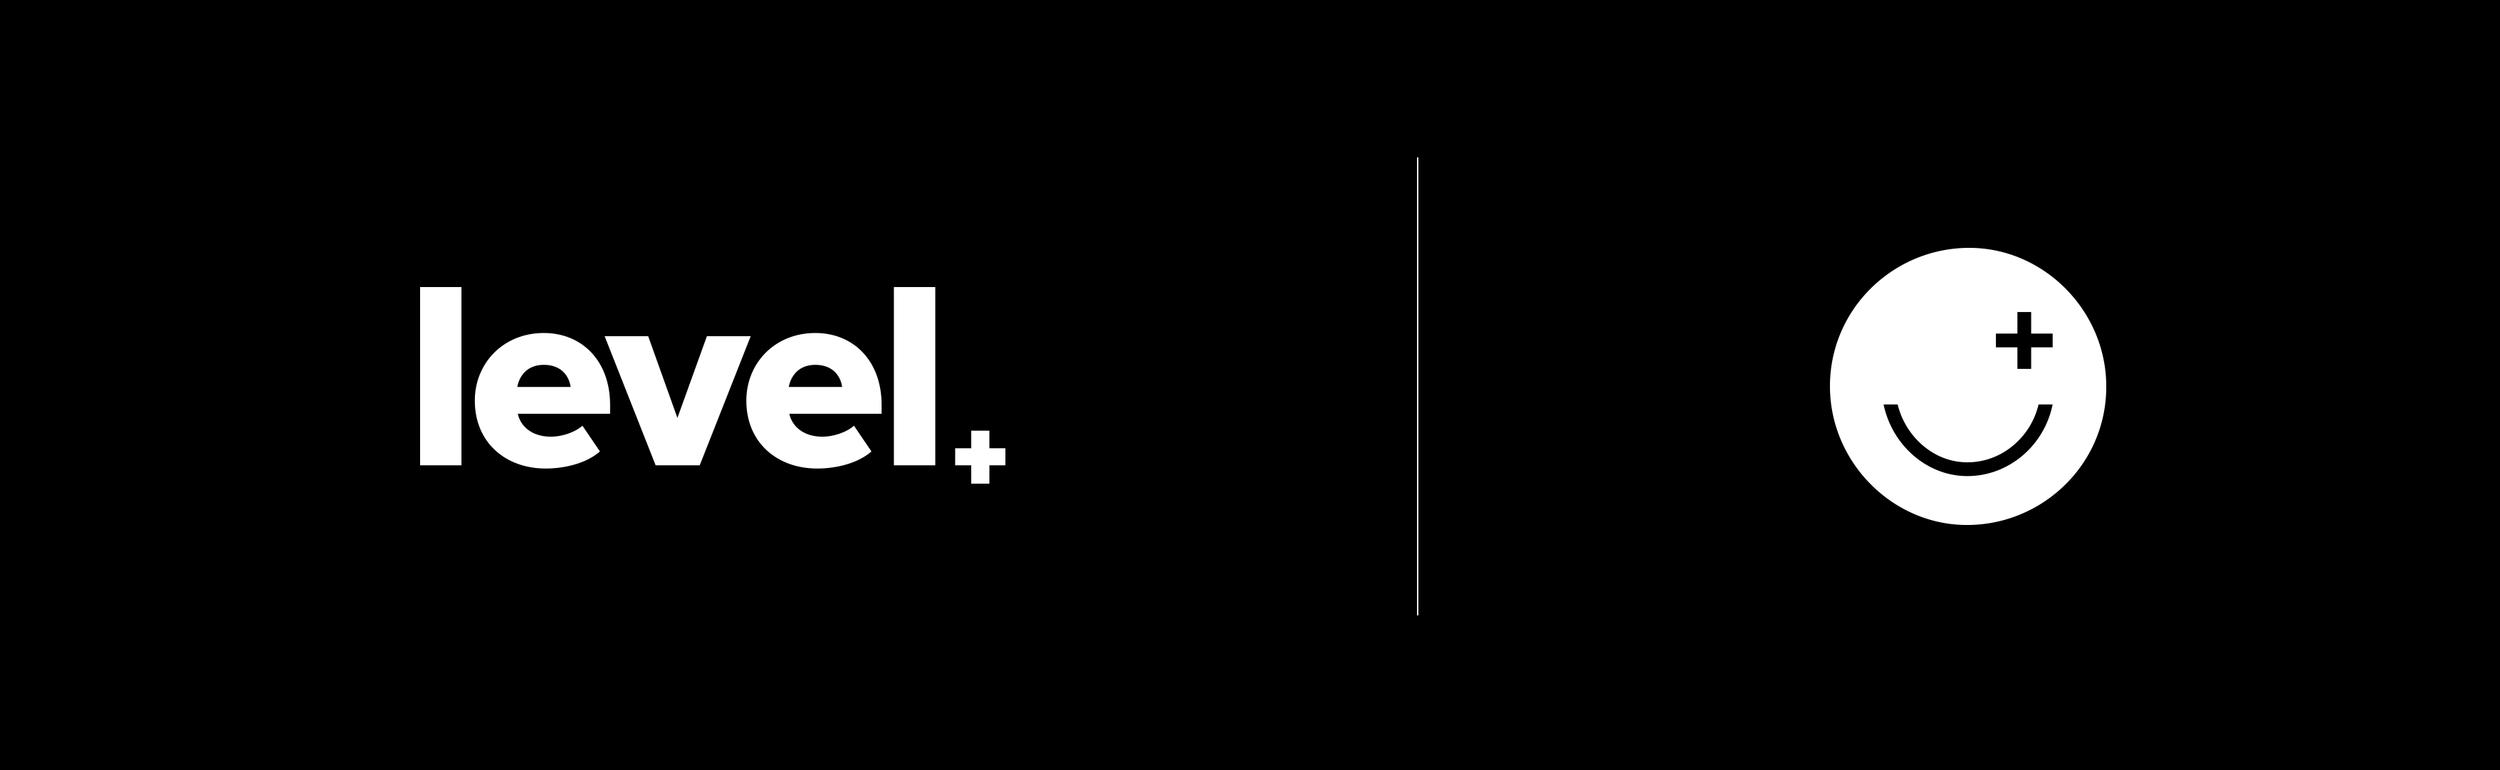 level-logolockup.png